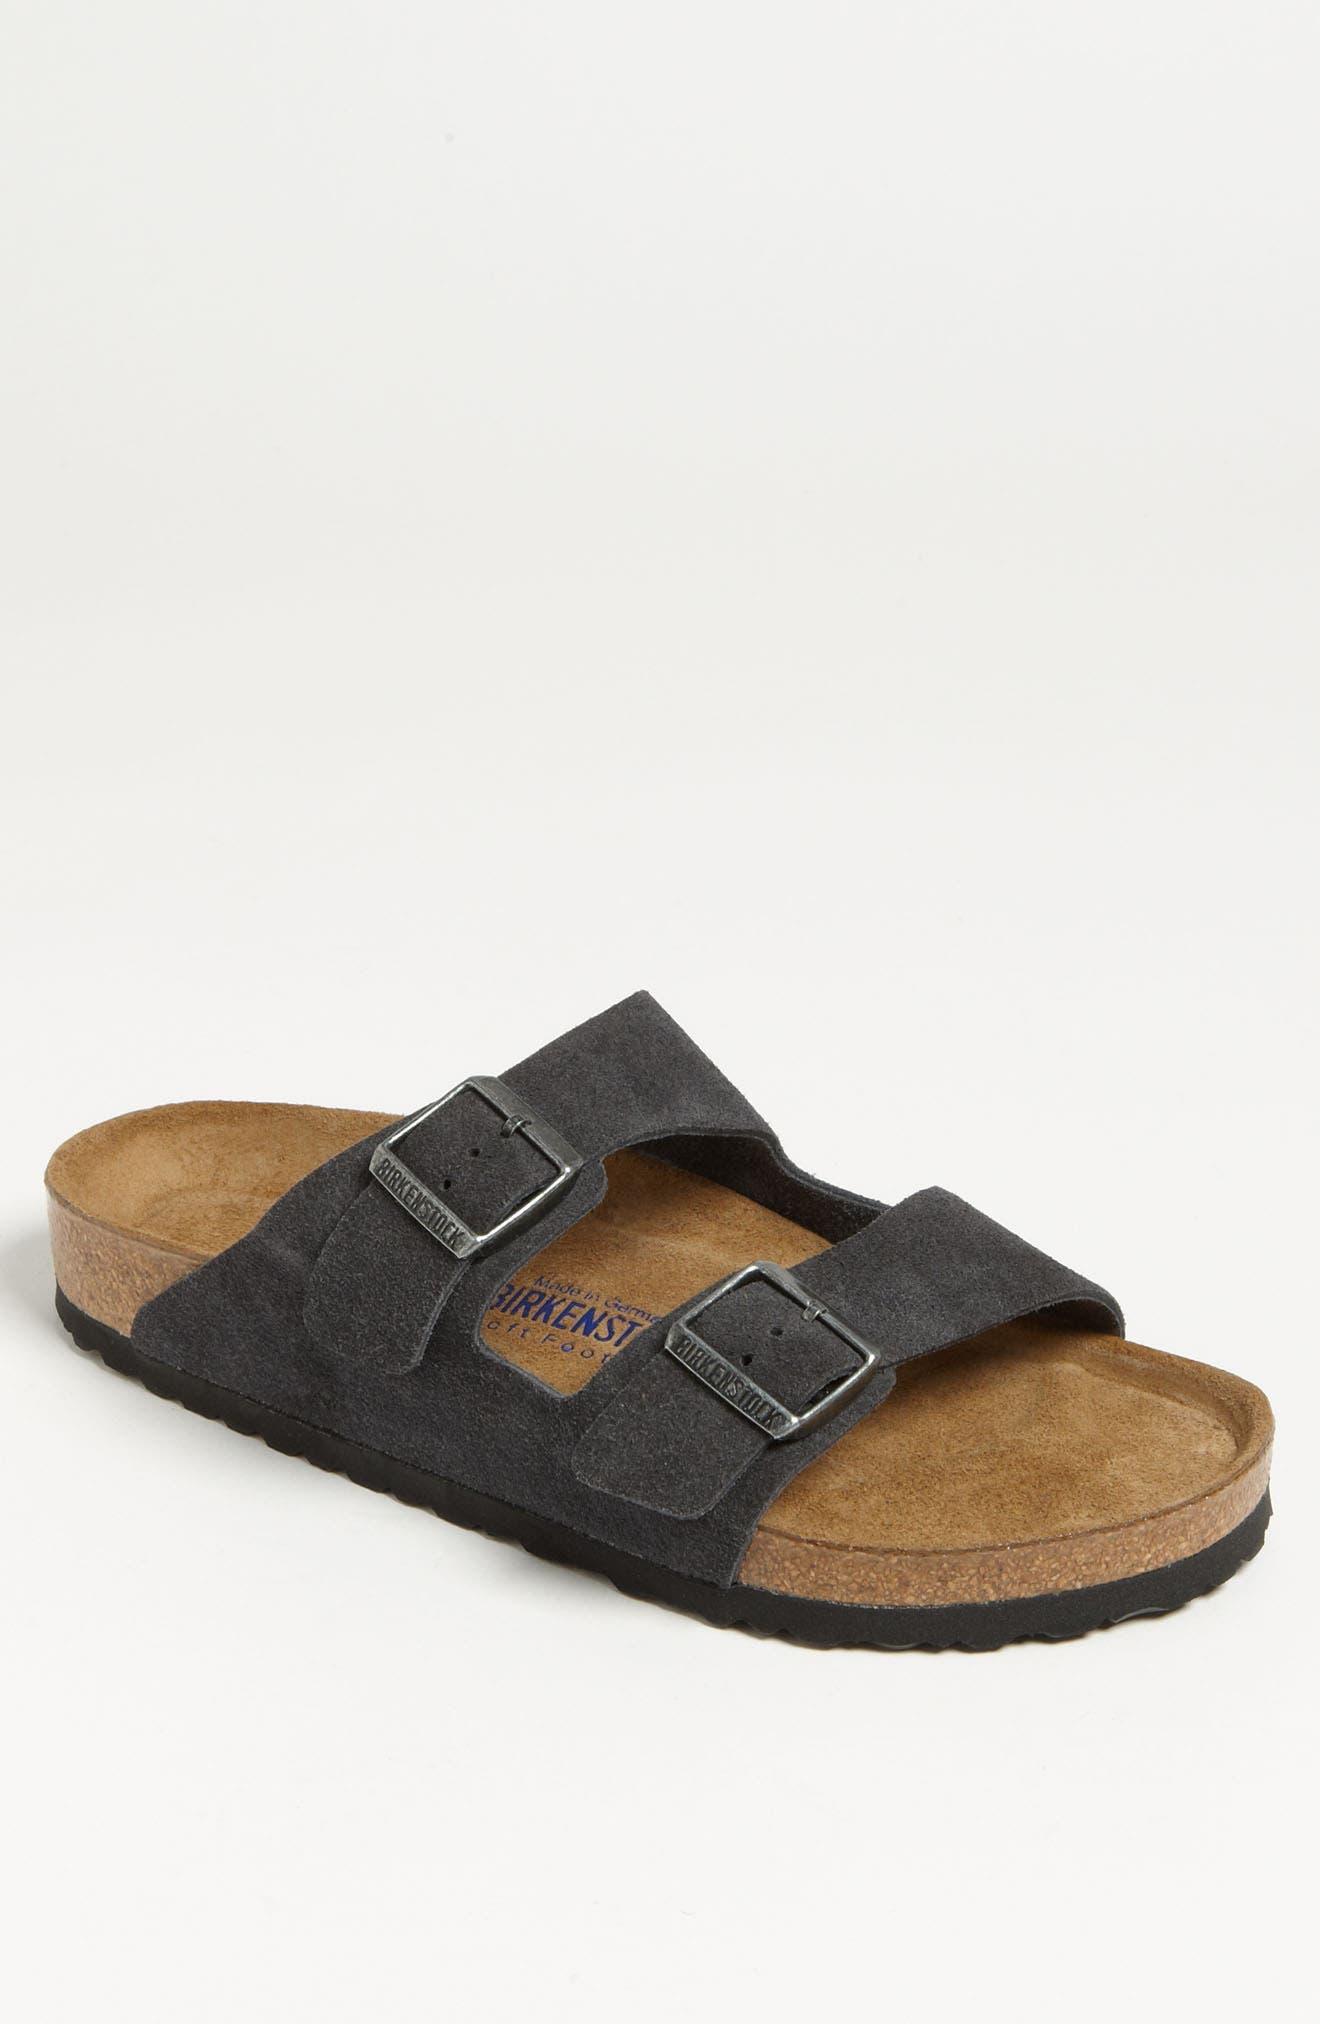 Birkenstock Arizona Soft Slide Sandal,10.5 - Grey